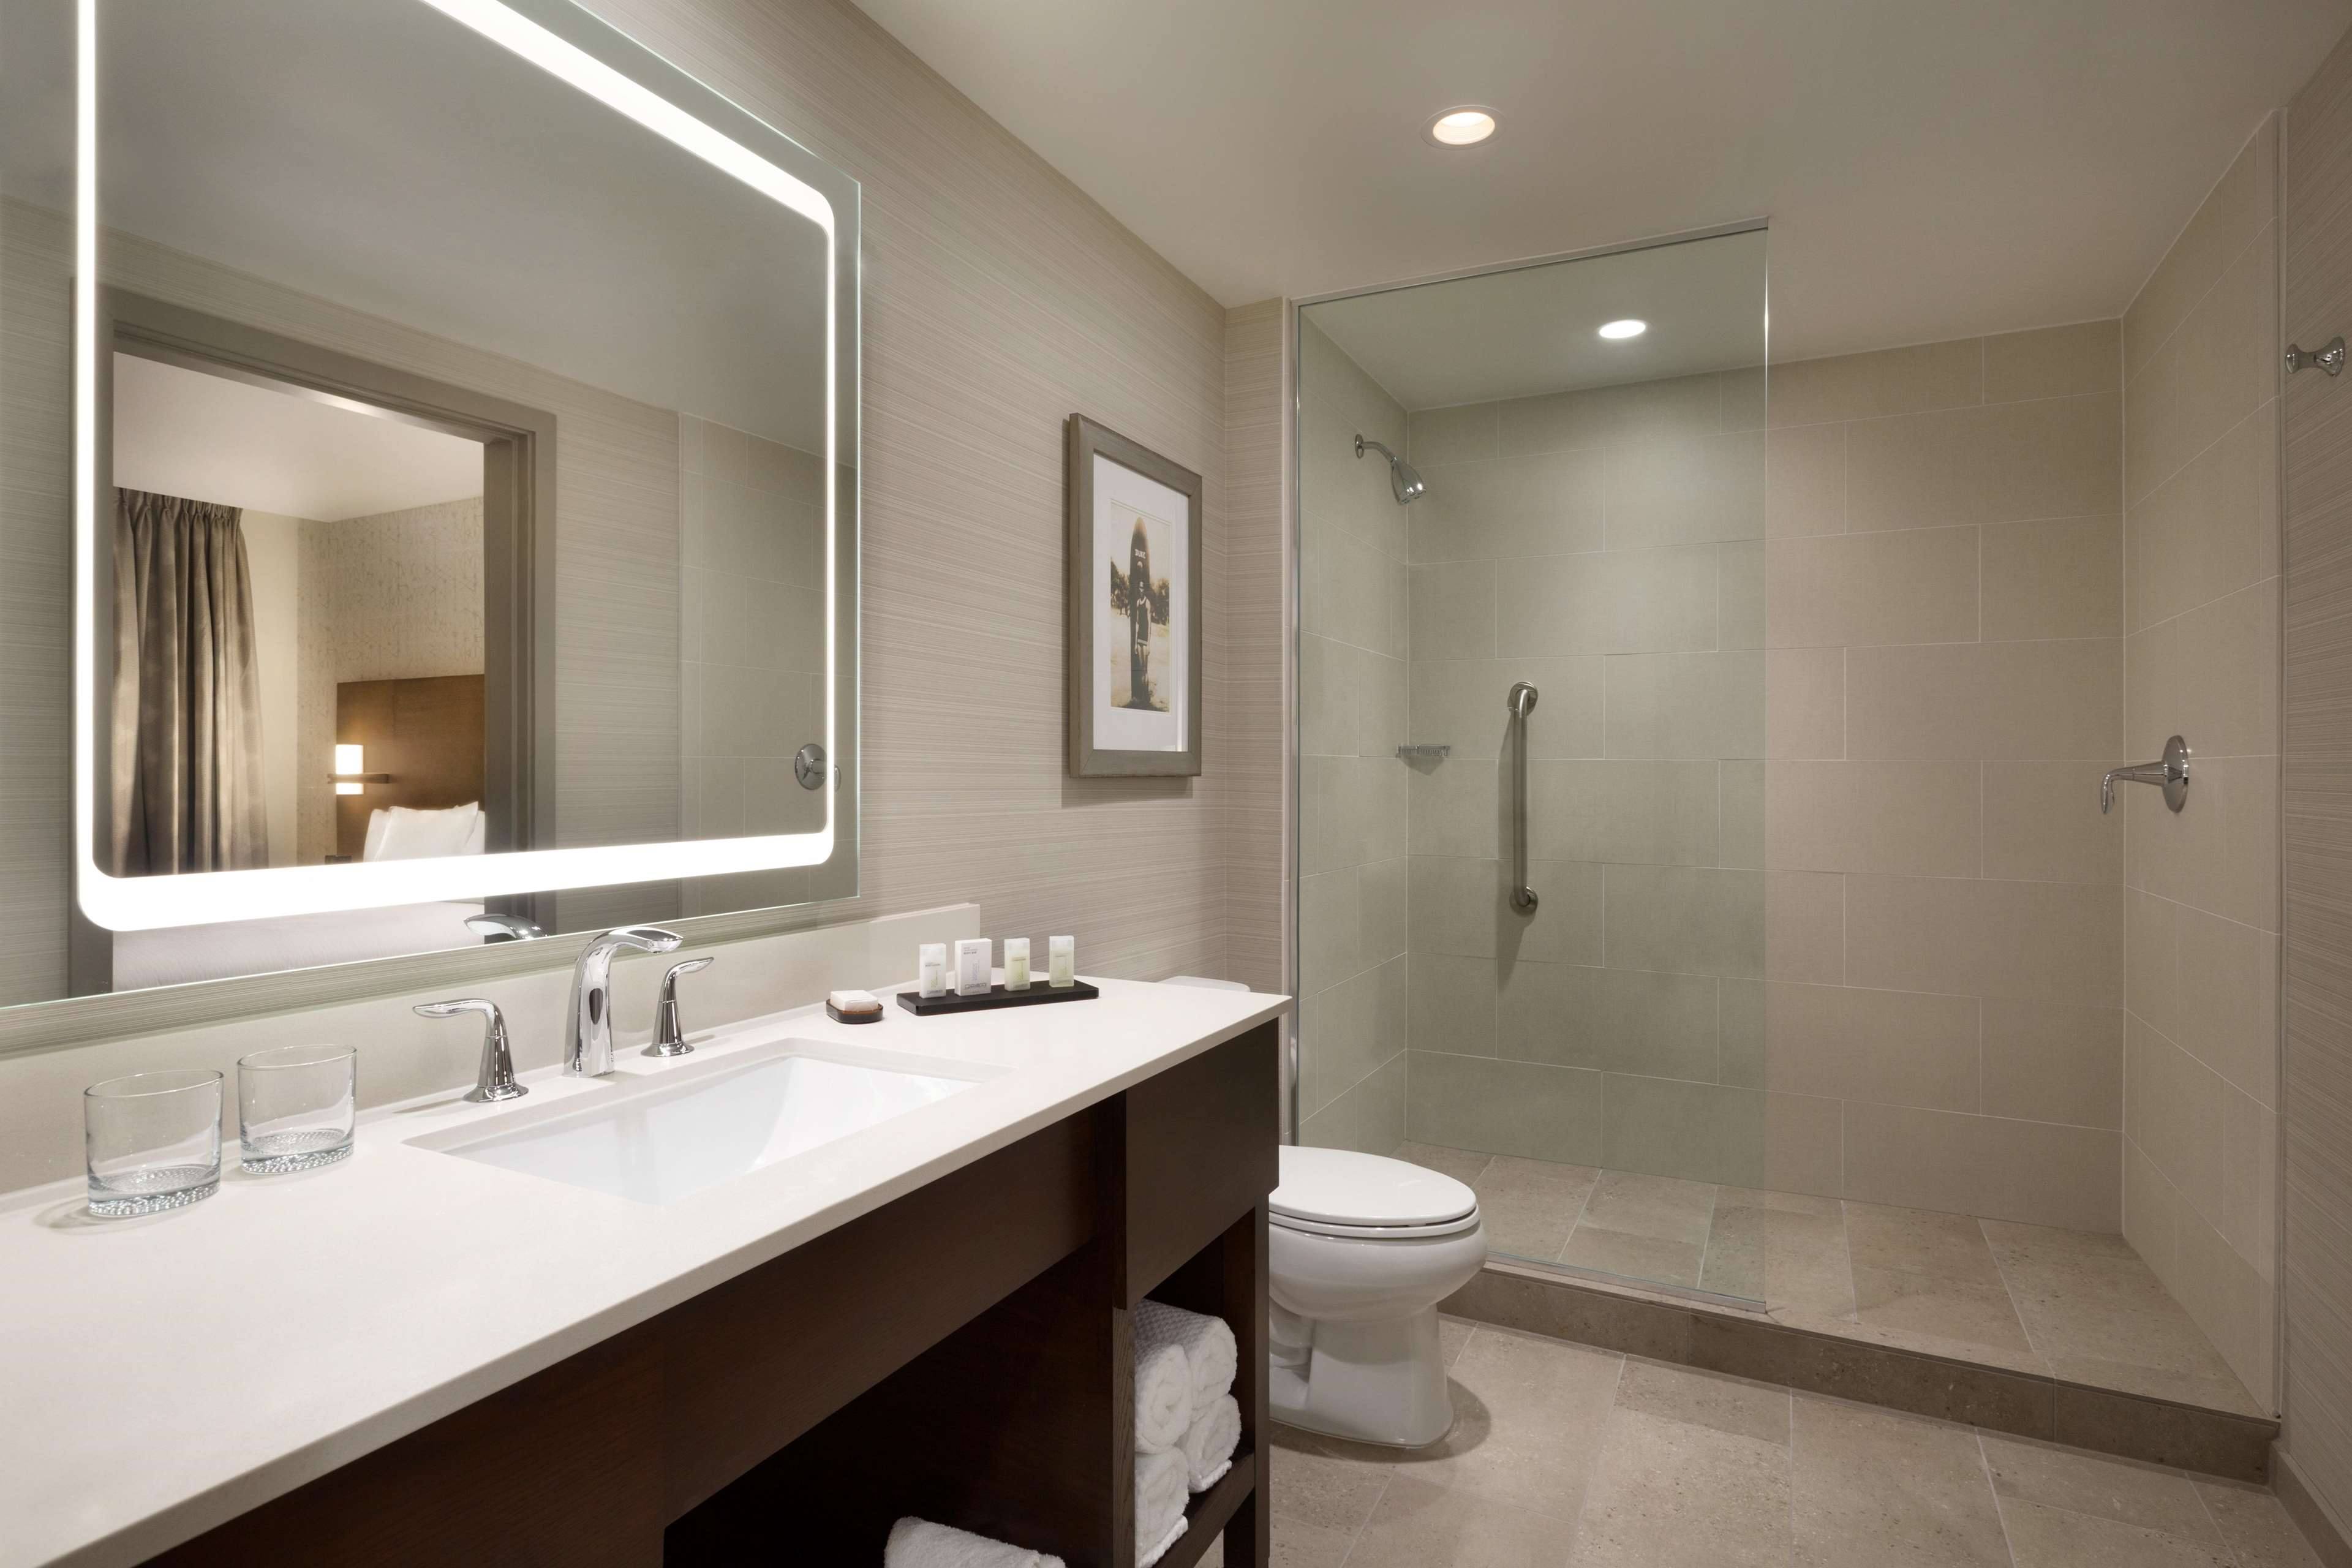 Embassy Suites by Hilton Oahu Kapolei image 24